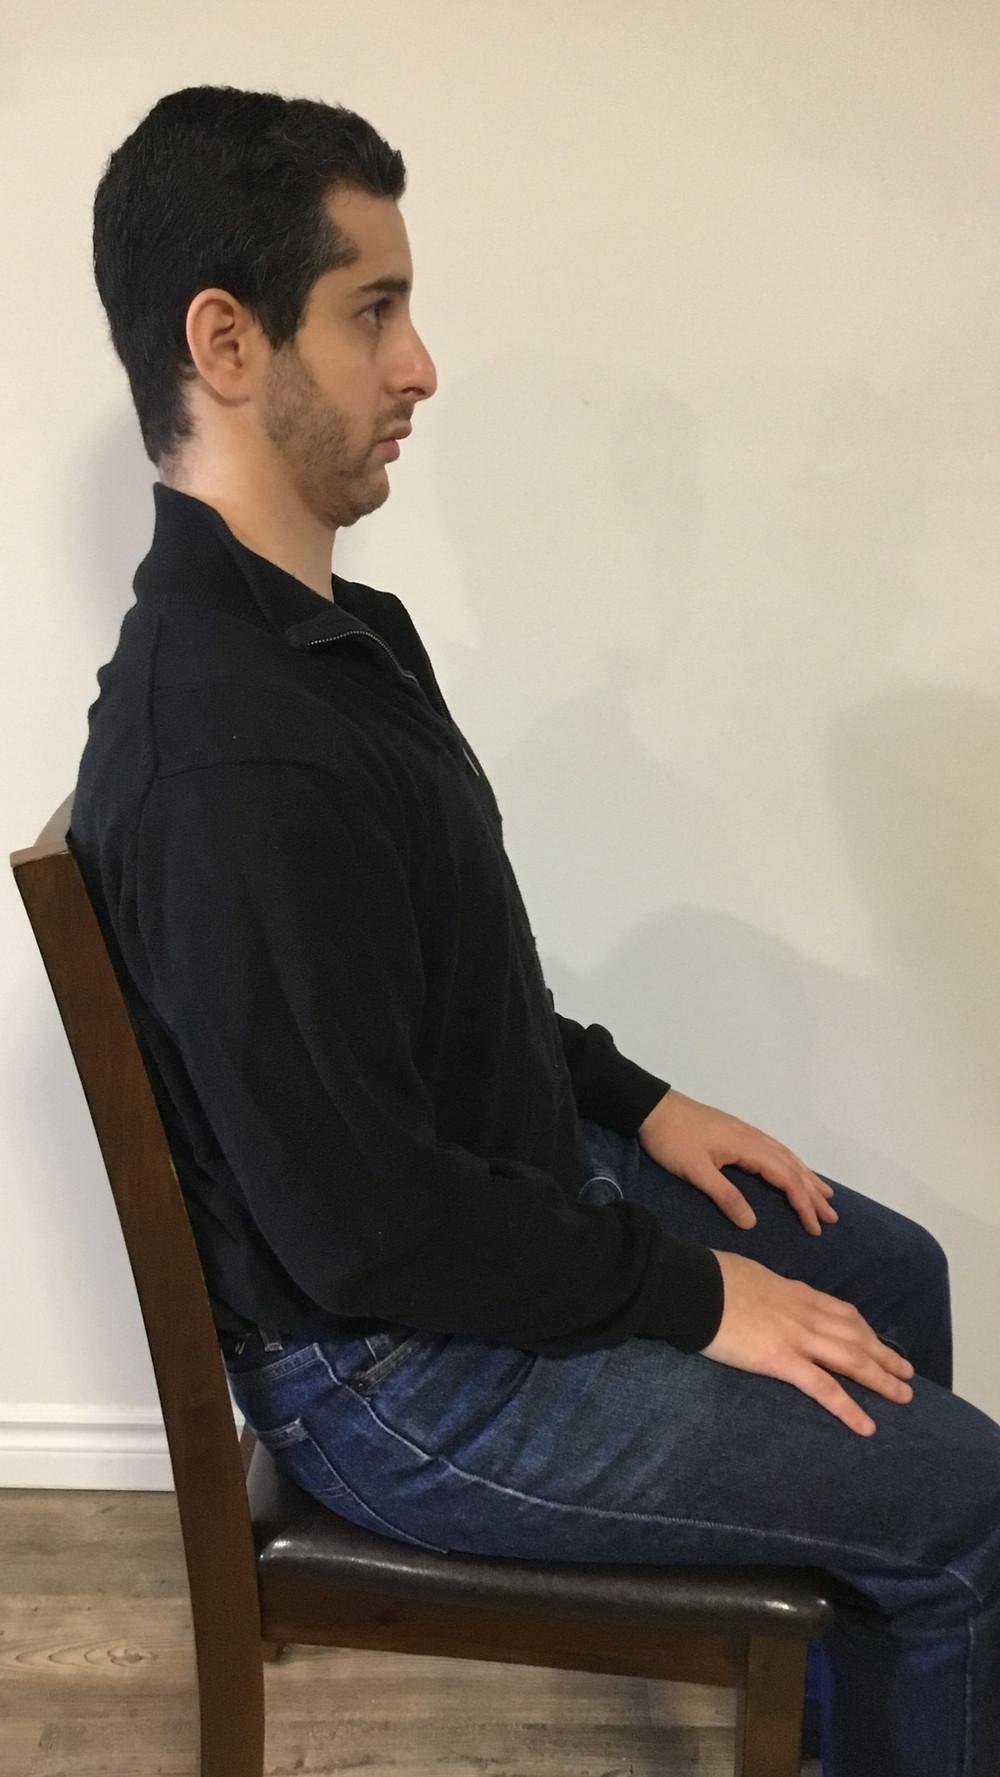 Neck pain, relief, stretch, exercise, headache, posture, suboccipitals, chin tucks